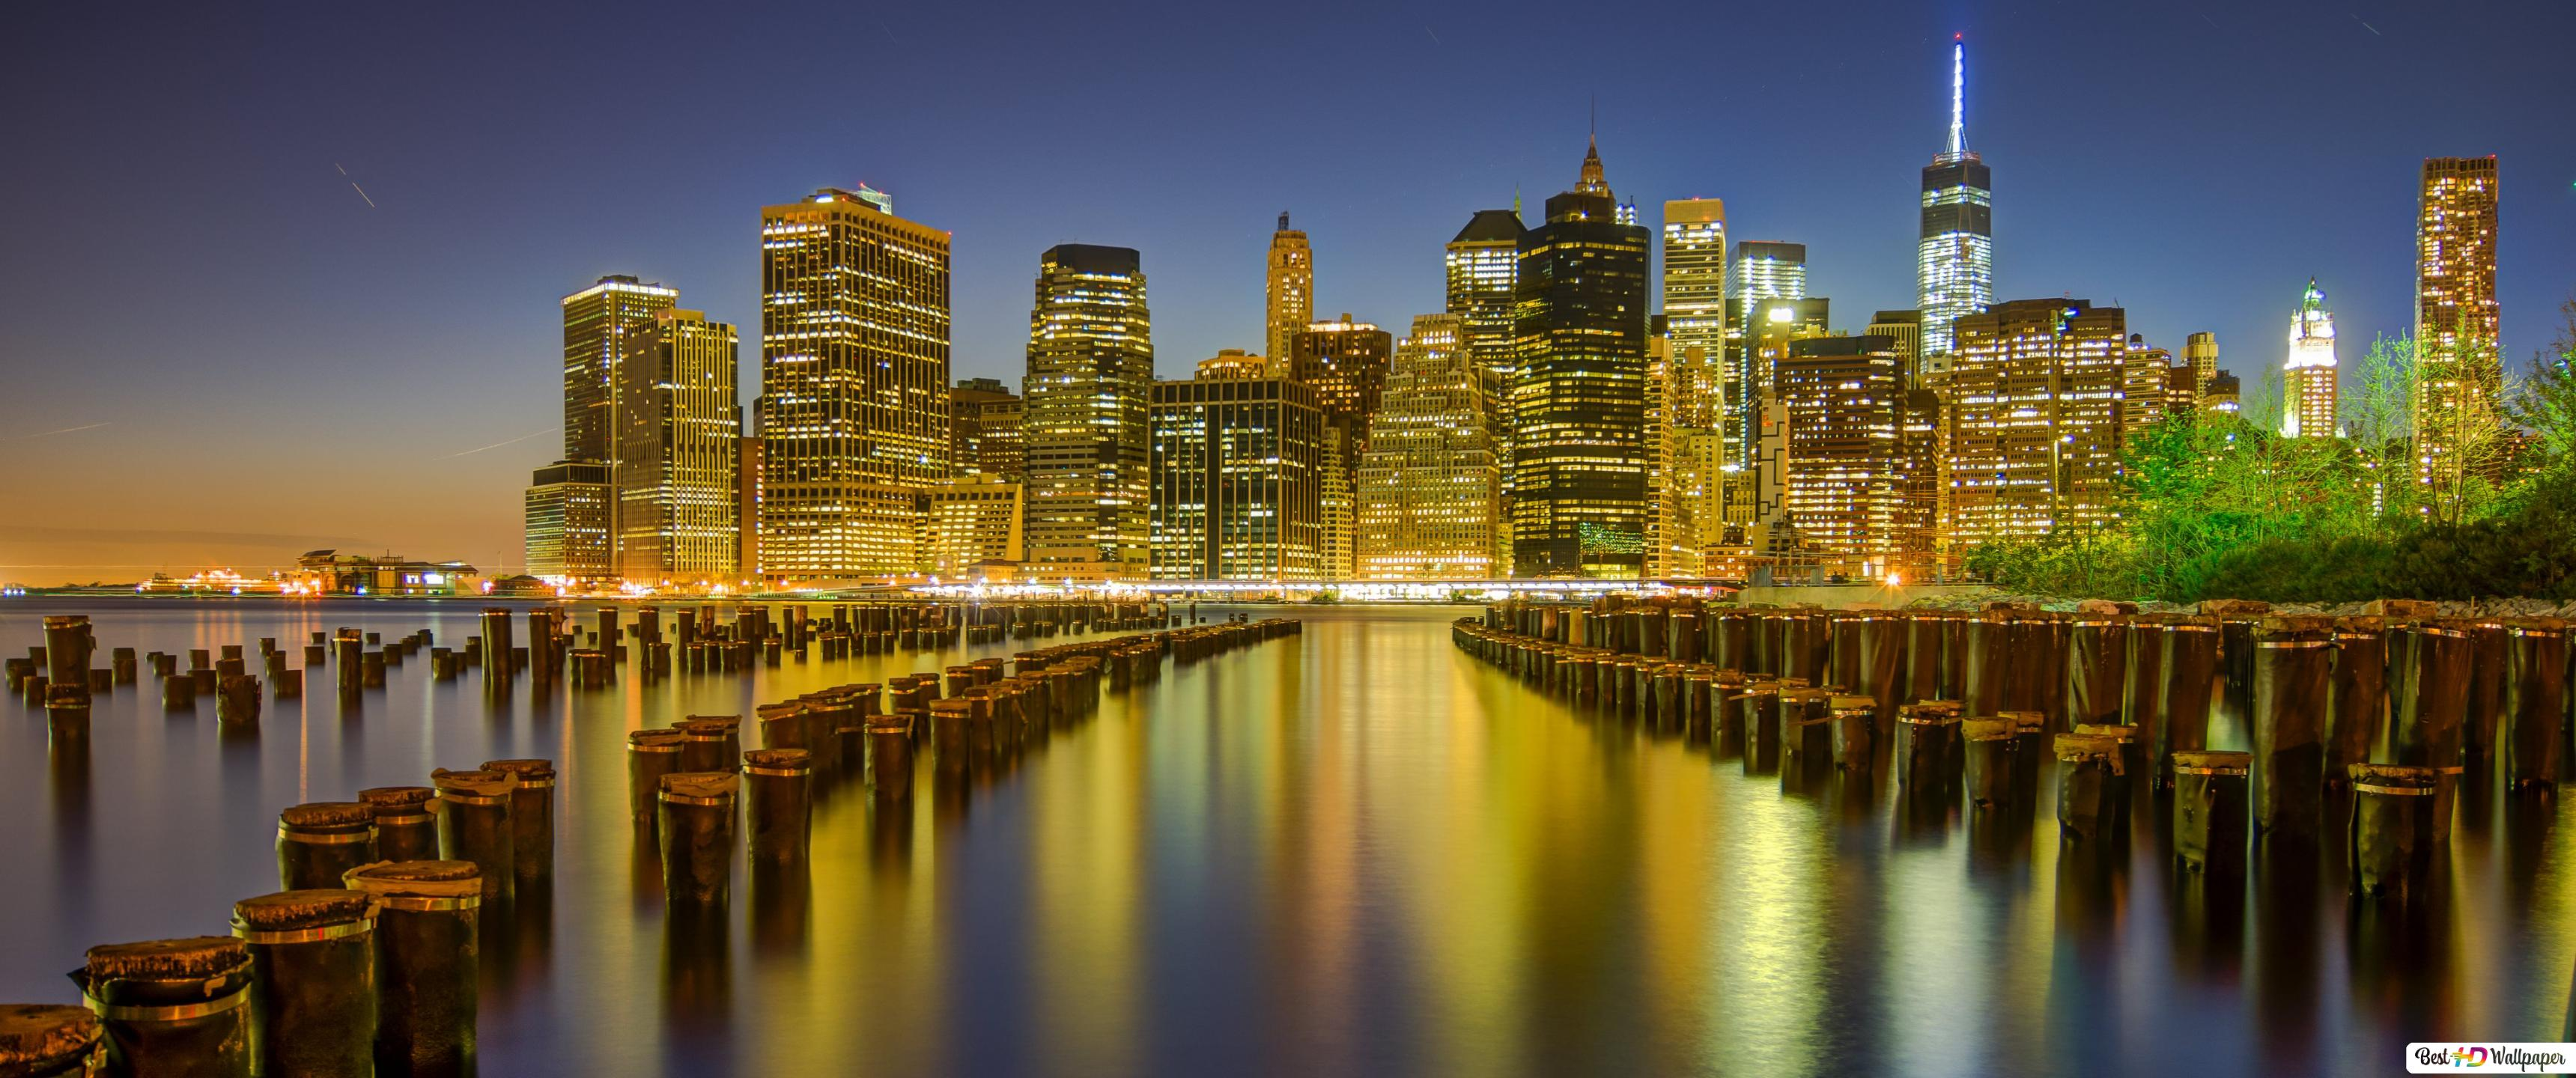 Manhattan Nuit New York City Hd Fond Décran Télécharger